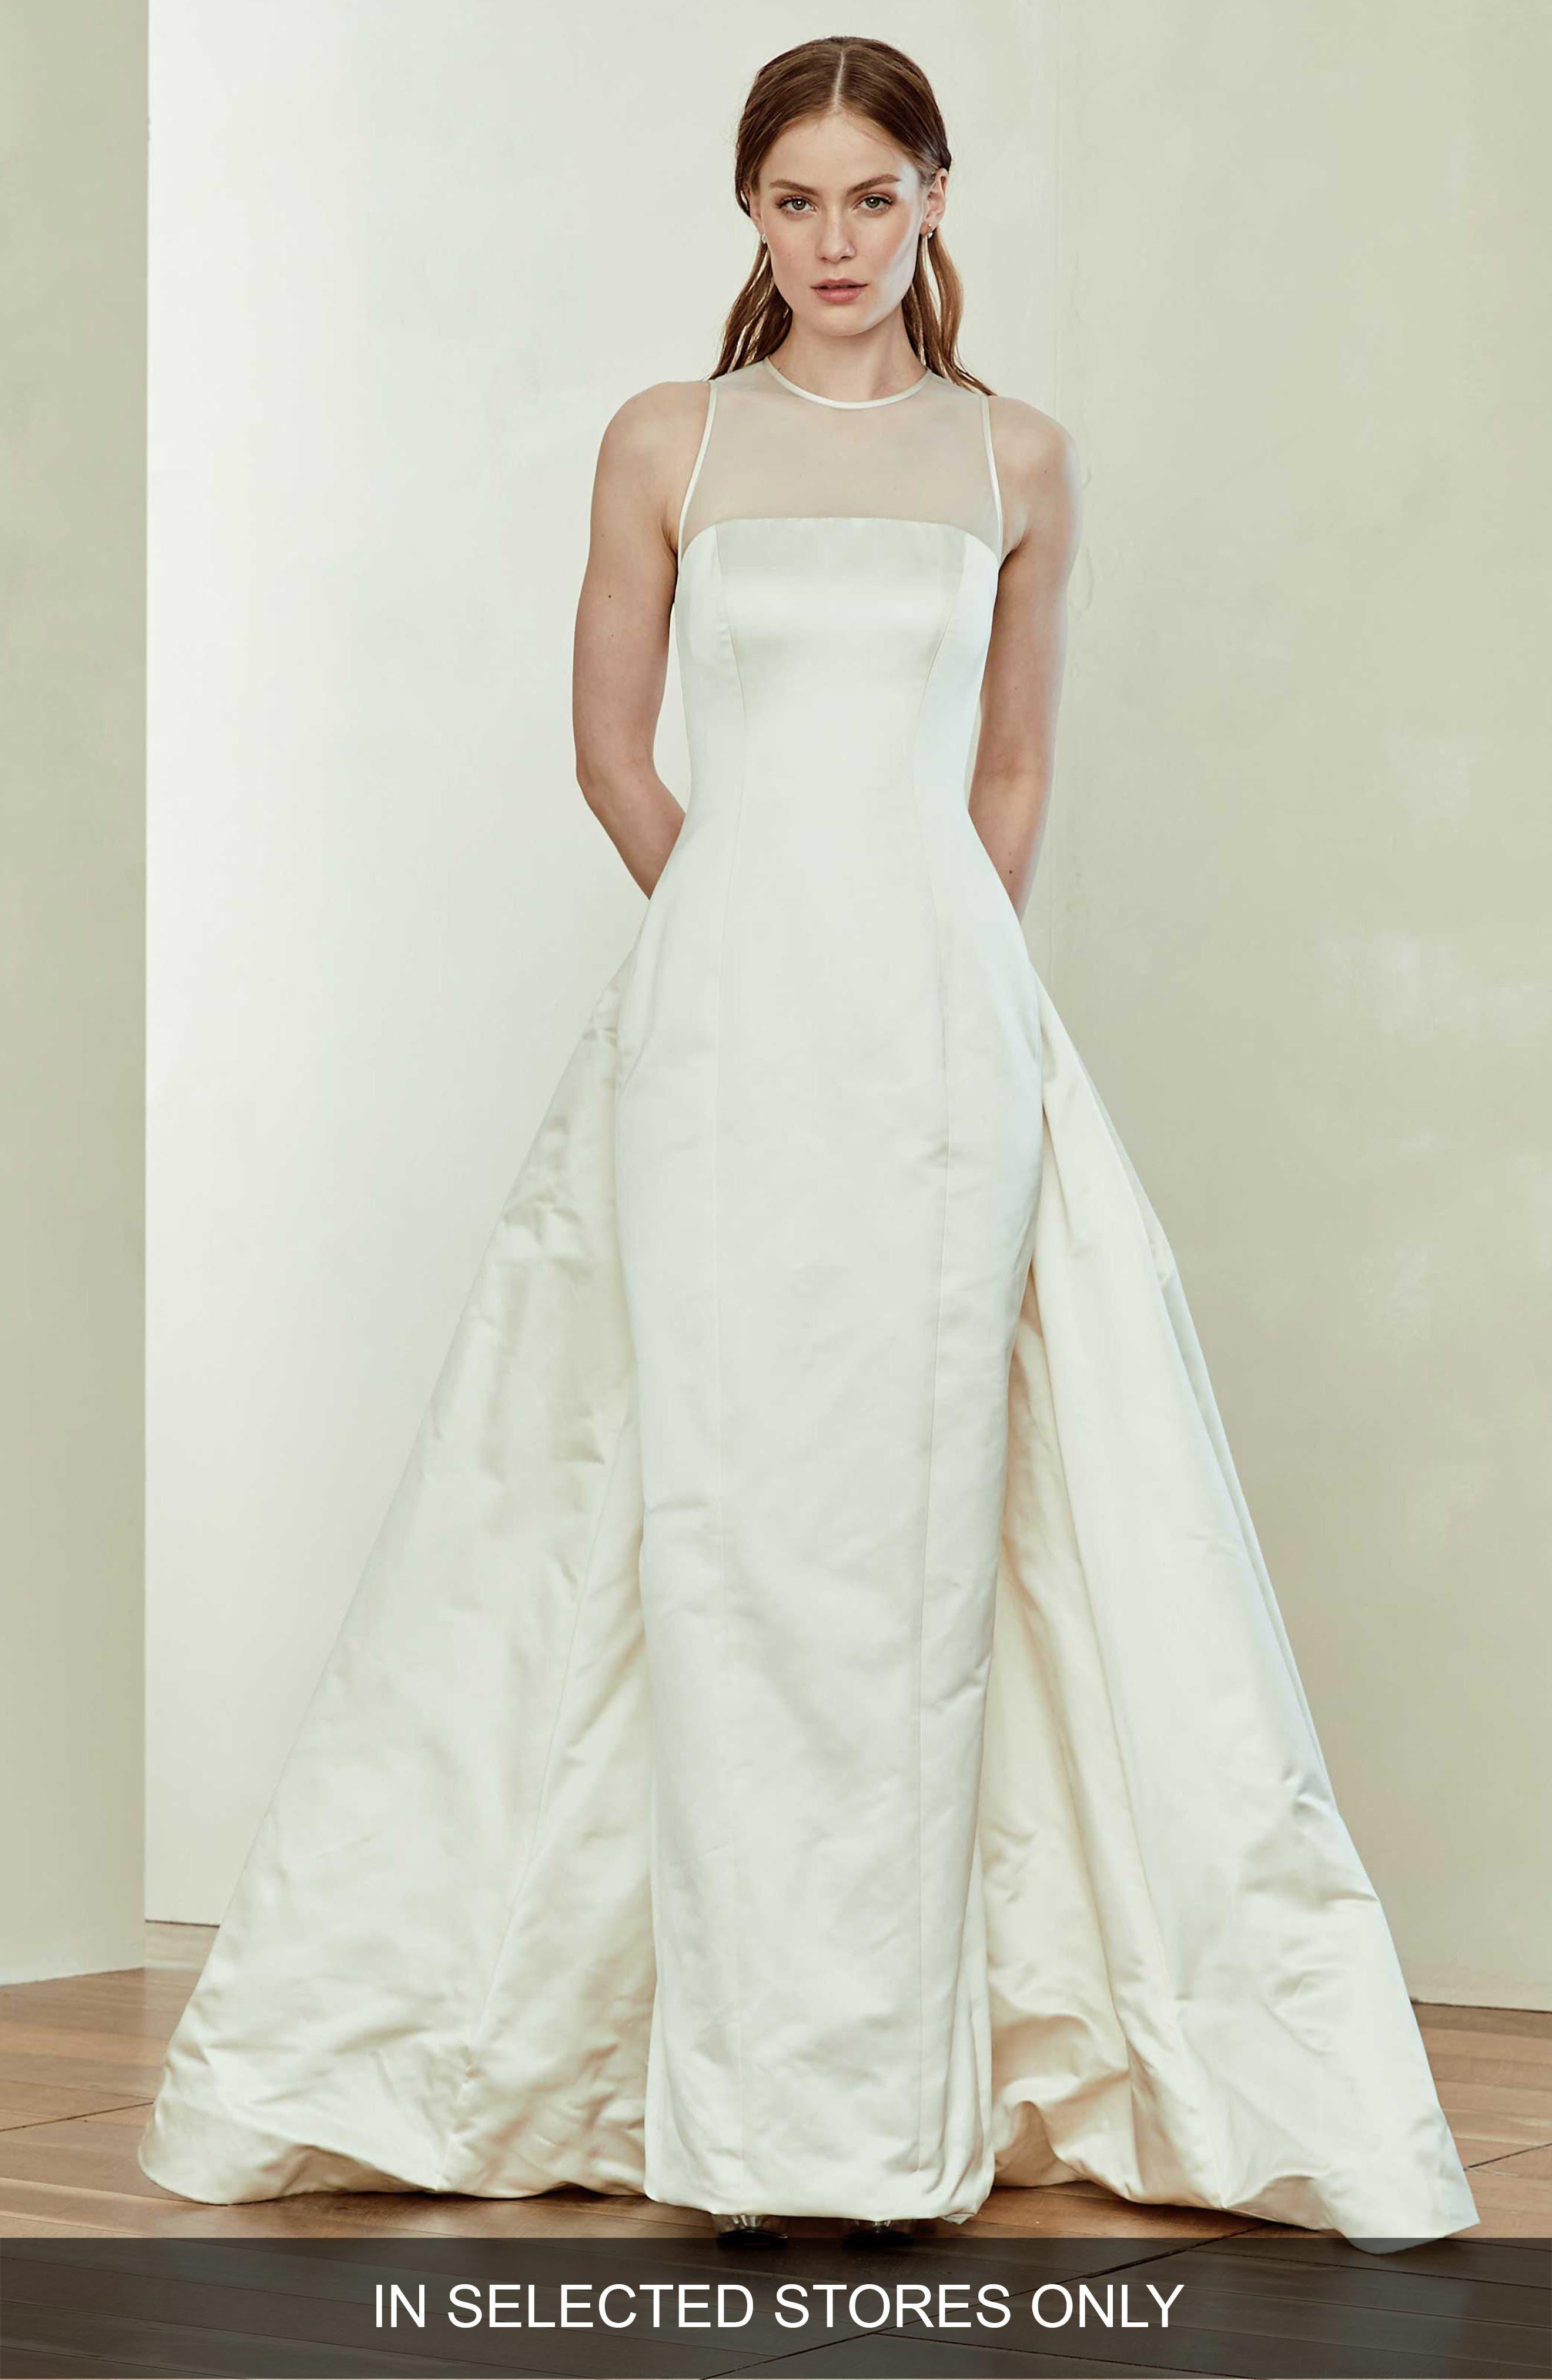 afdb9fb3aa721 Amsale Wedding Dresses & Bridal Gowns | Nordstrom